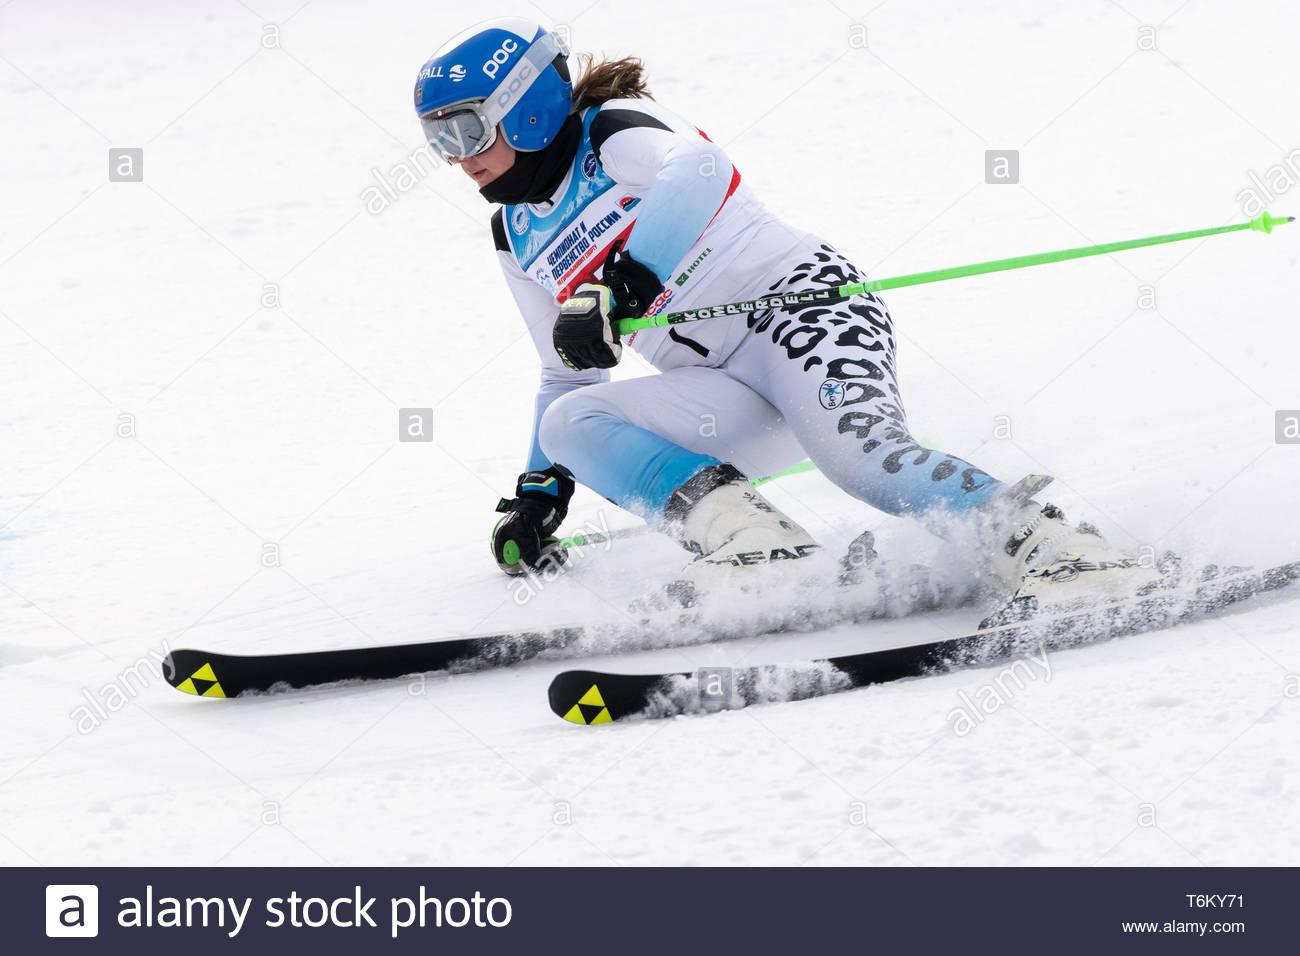 KAMCHATKA PENINSULA, RUSSIA - APR 2, 2019: Mountain skier Minaeva Anastasia (Murmansk) skiing down mount slope. International Ski Federation Champions - Stock Image